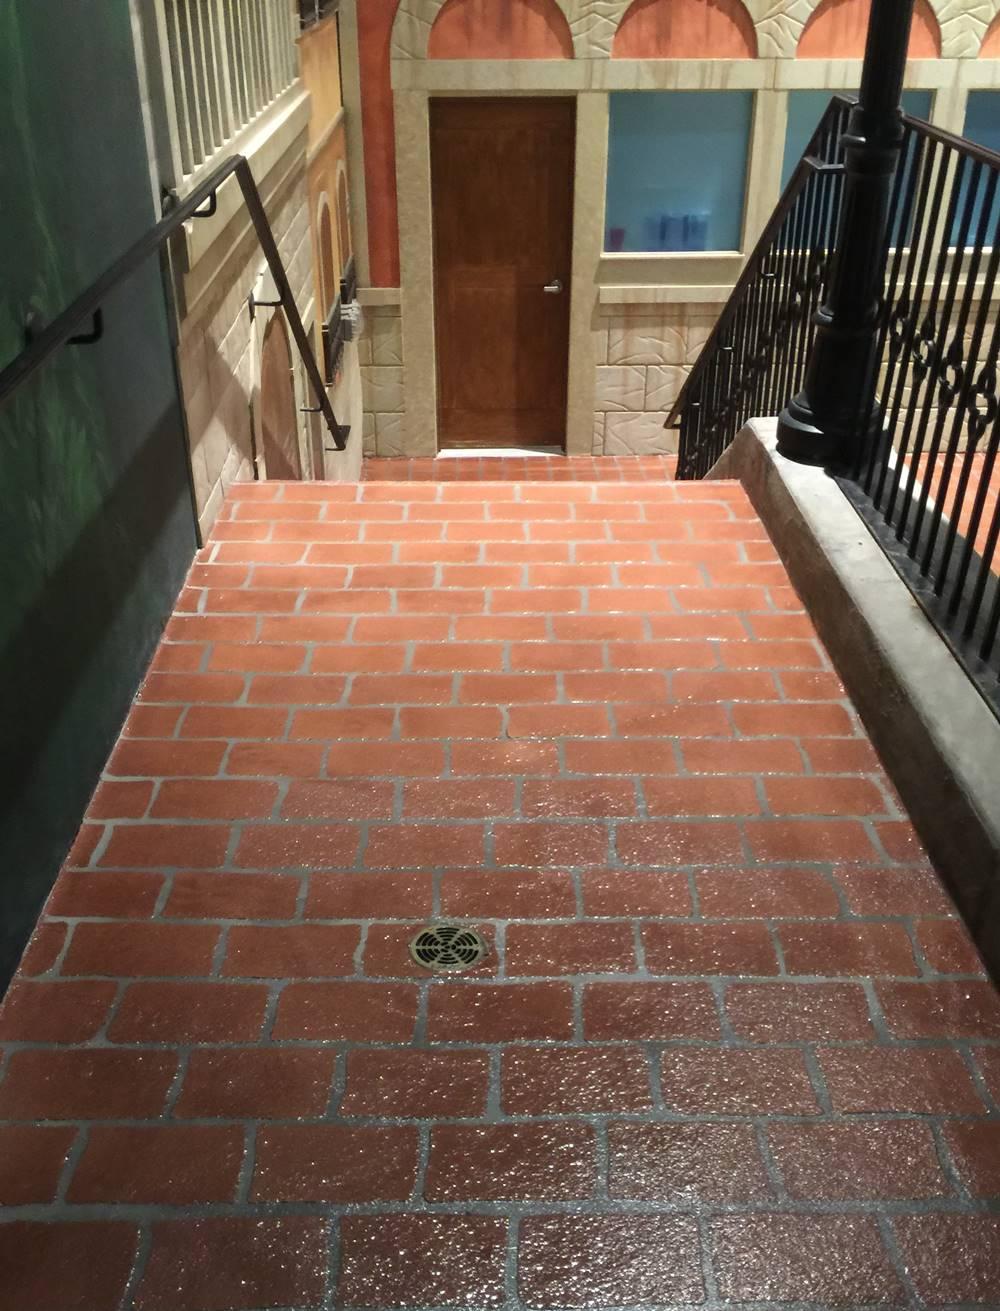 cobblestone stencils placed on a stairway